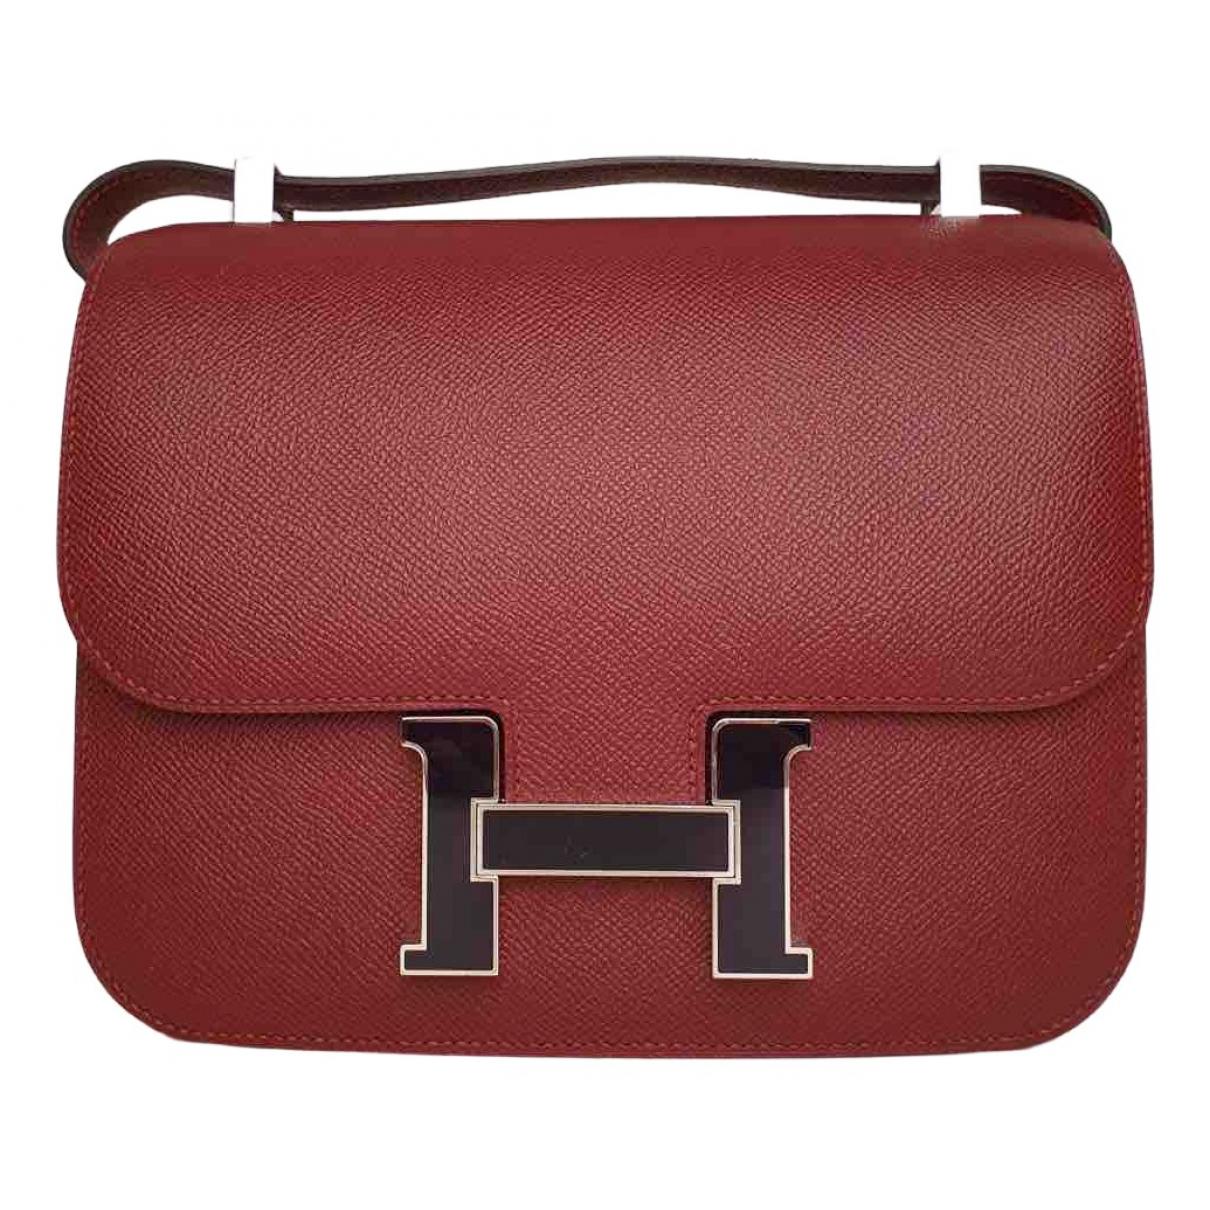 Hermès Constance Burgundy Leather handbag for Women N